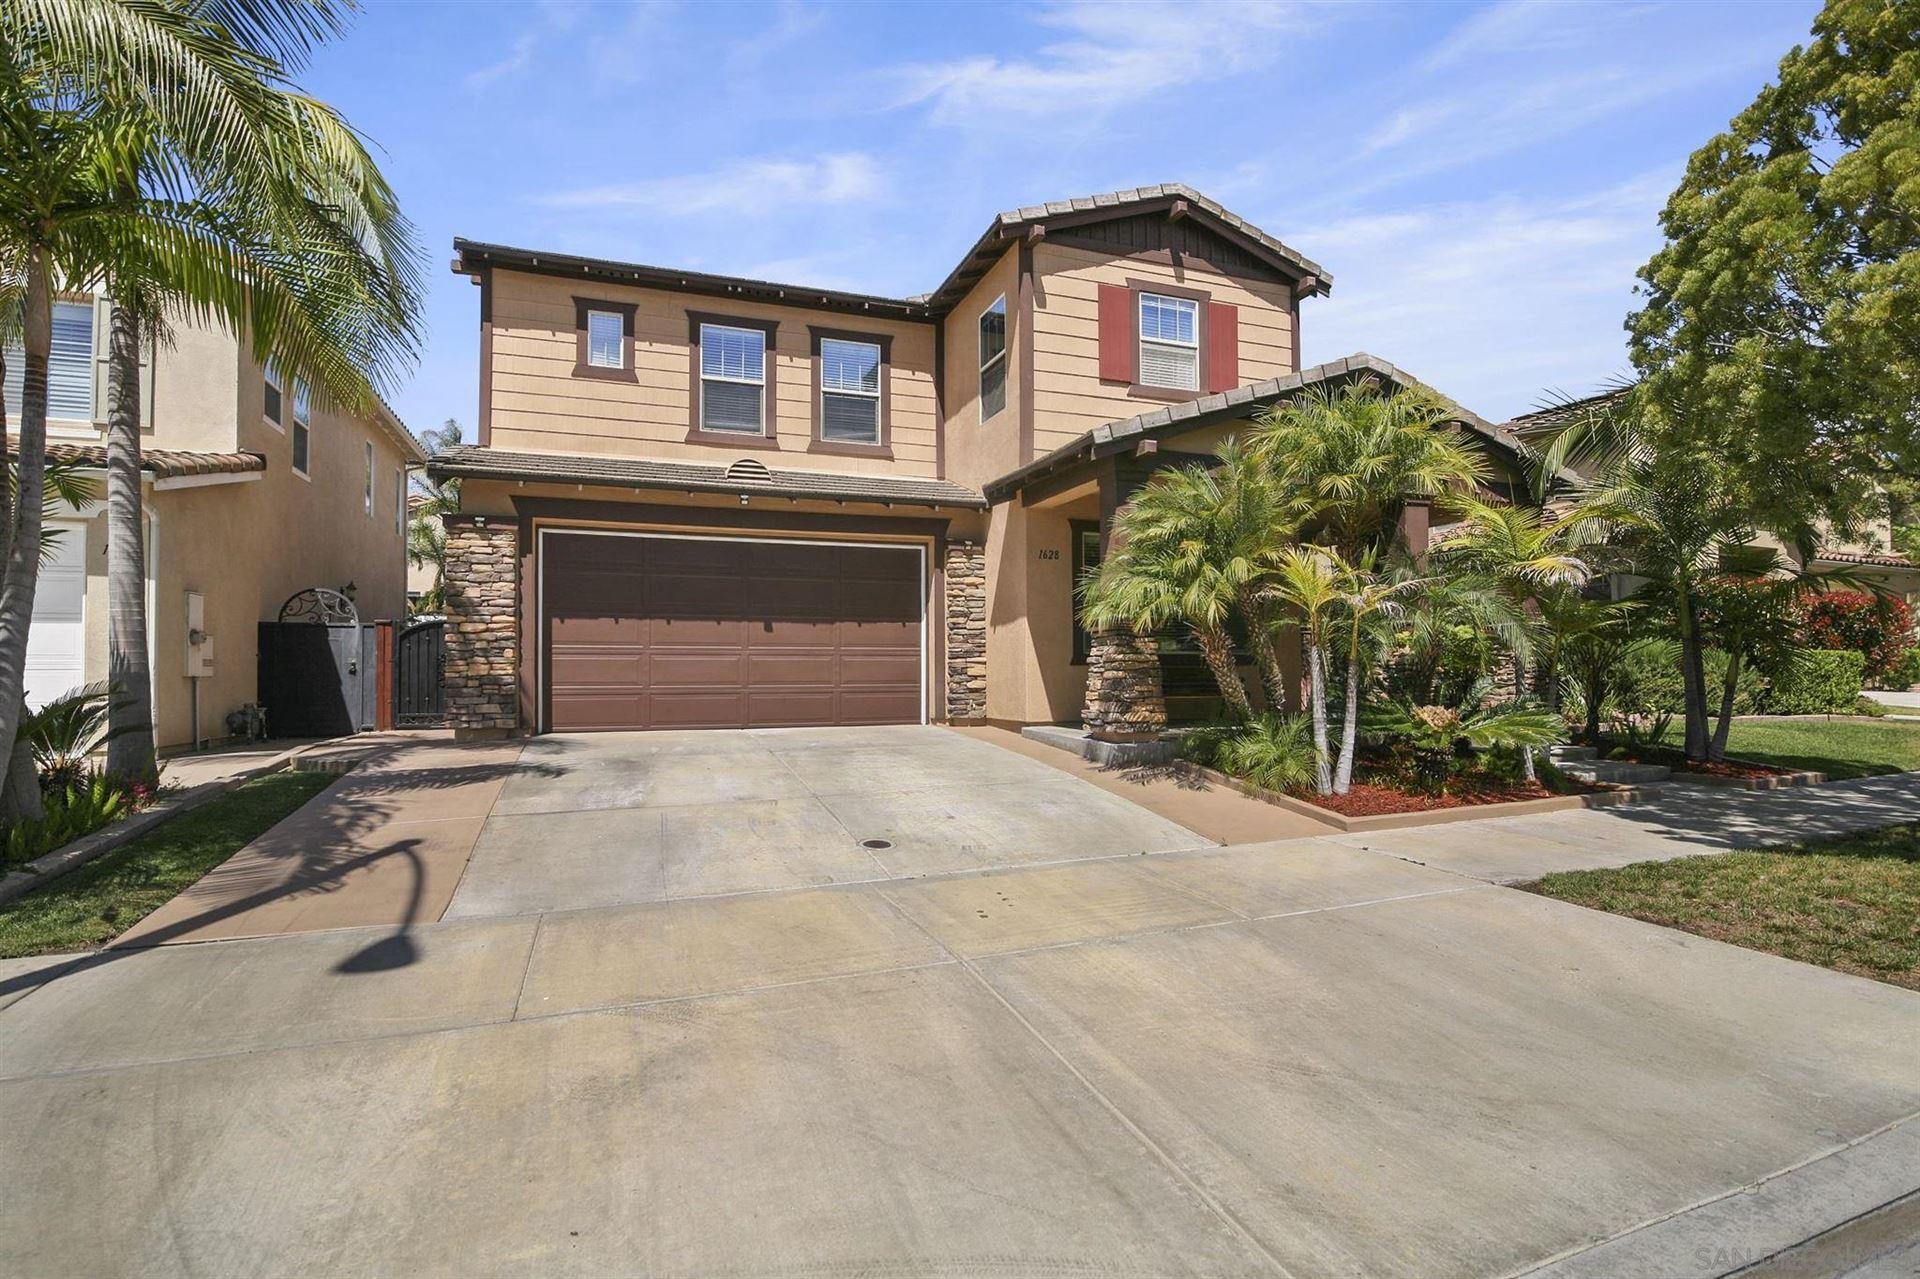 1628 Picket Fence Dr., Chula Vista, CA 91915 - #: 210012074